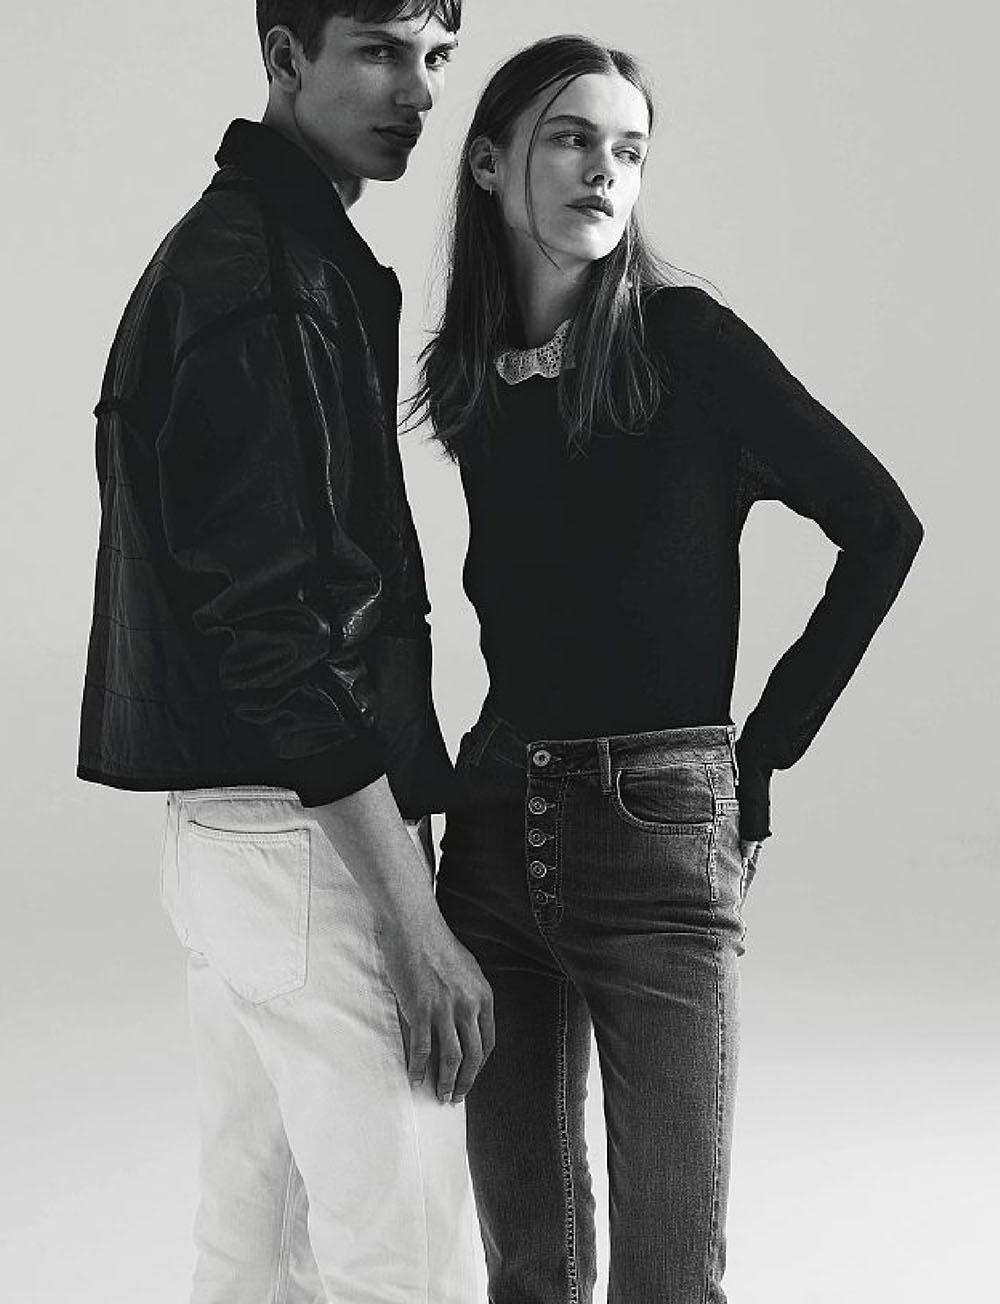 Stina Rapp Wastenson and Vilhelm Jakobsson by Tomas Falmer for Amica Magazine June 2020